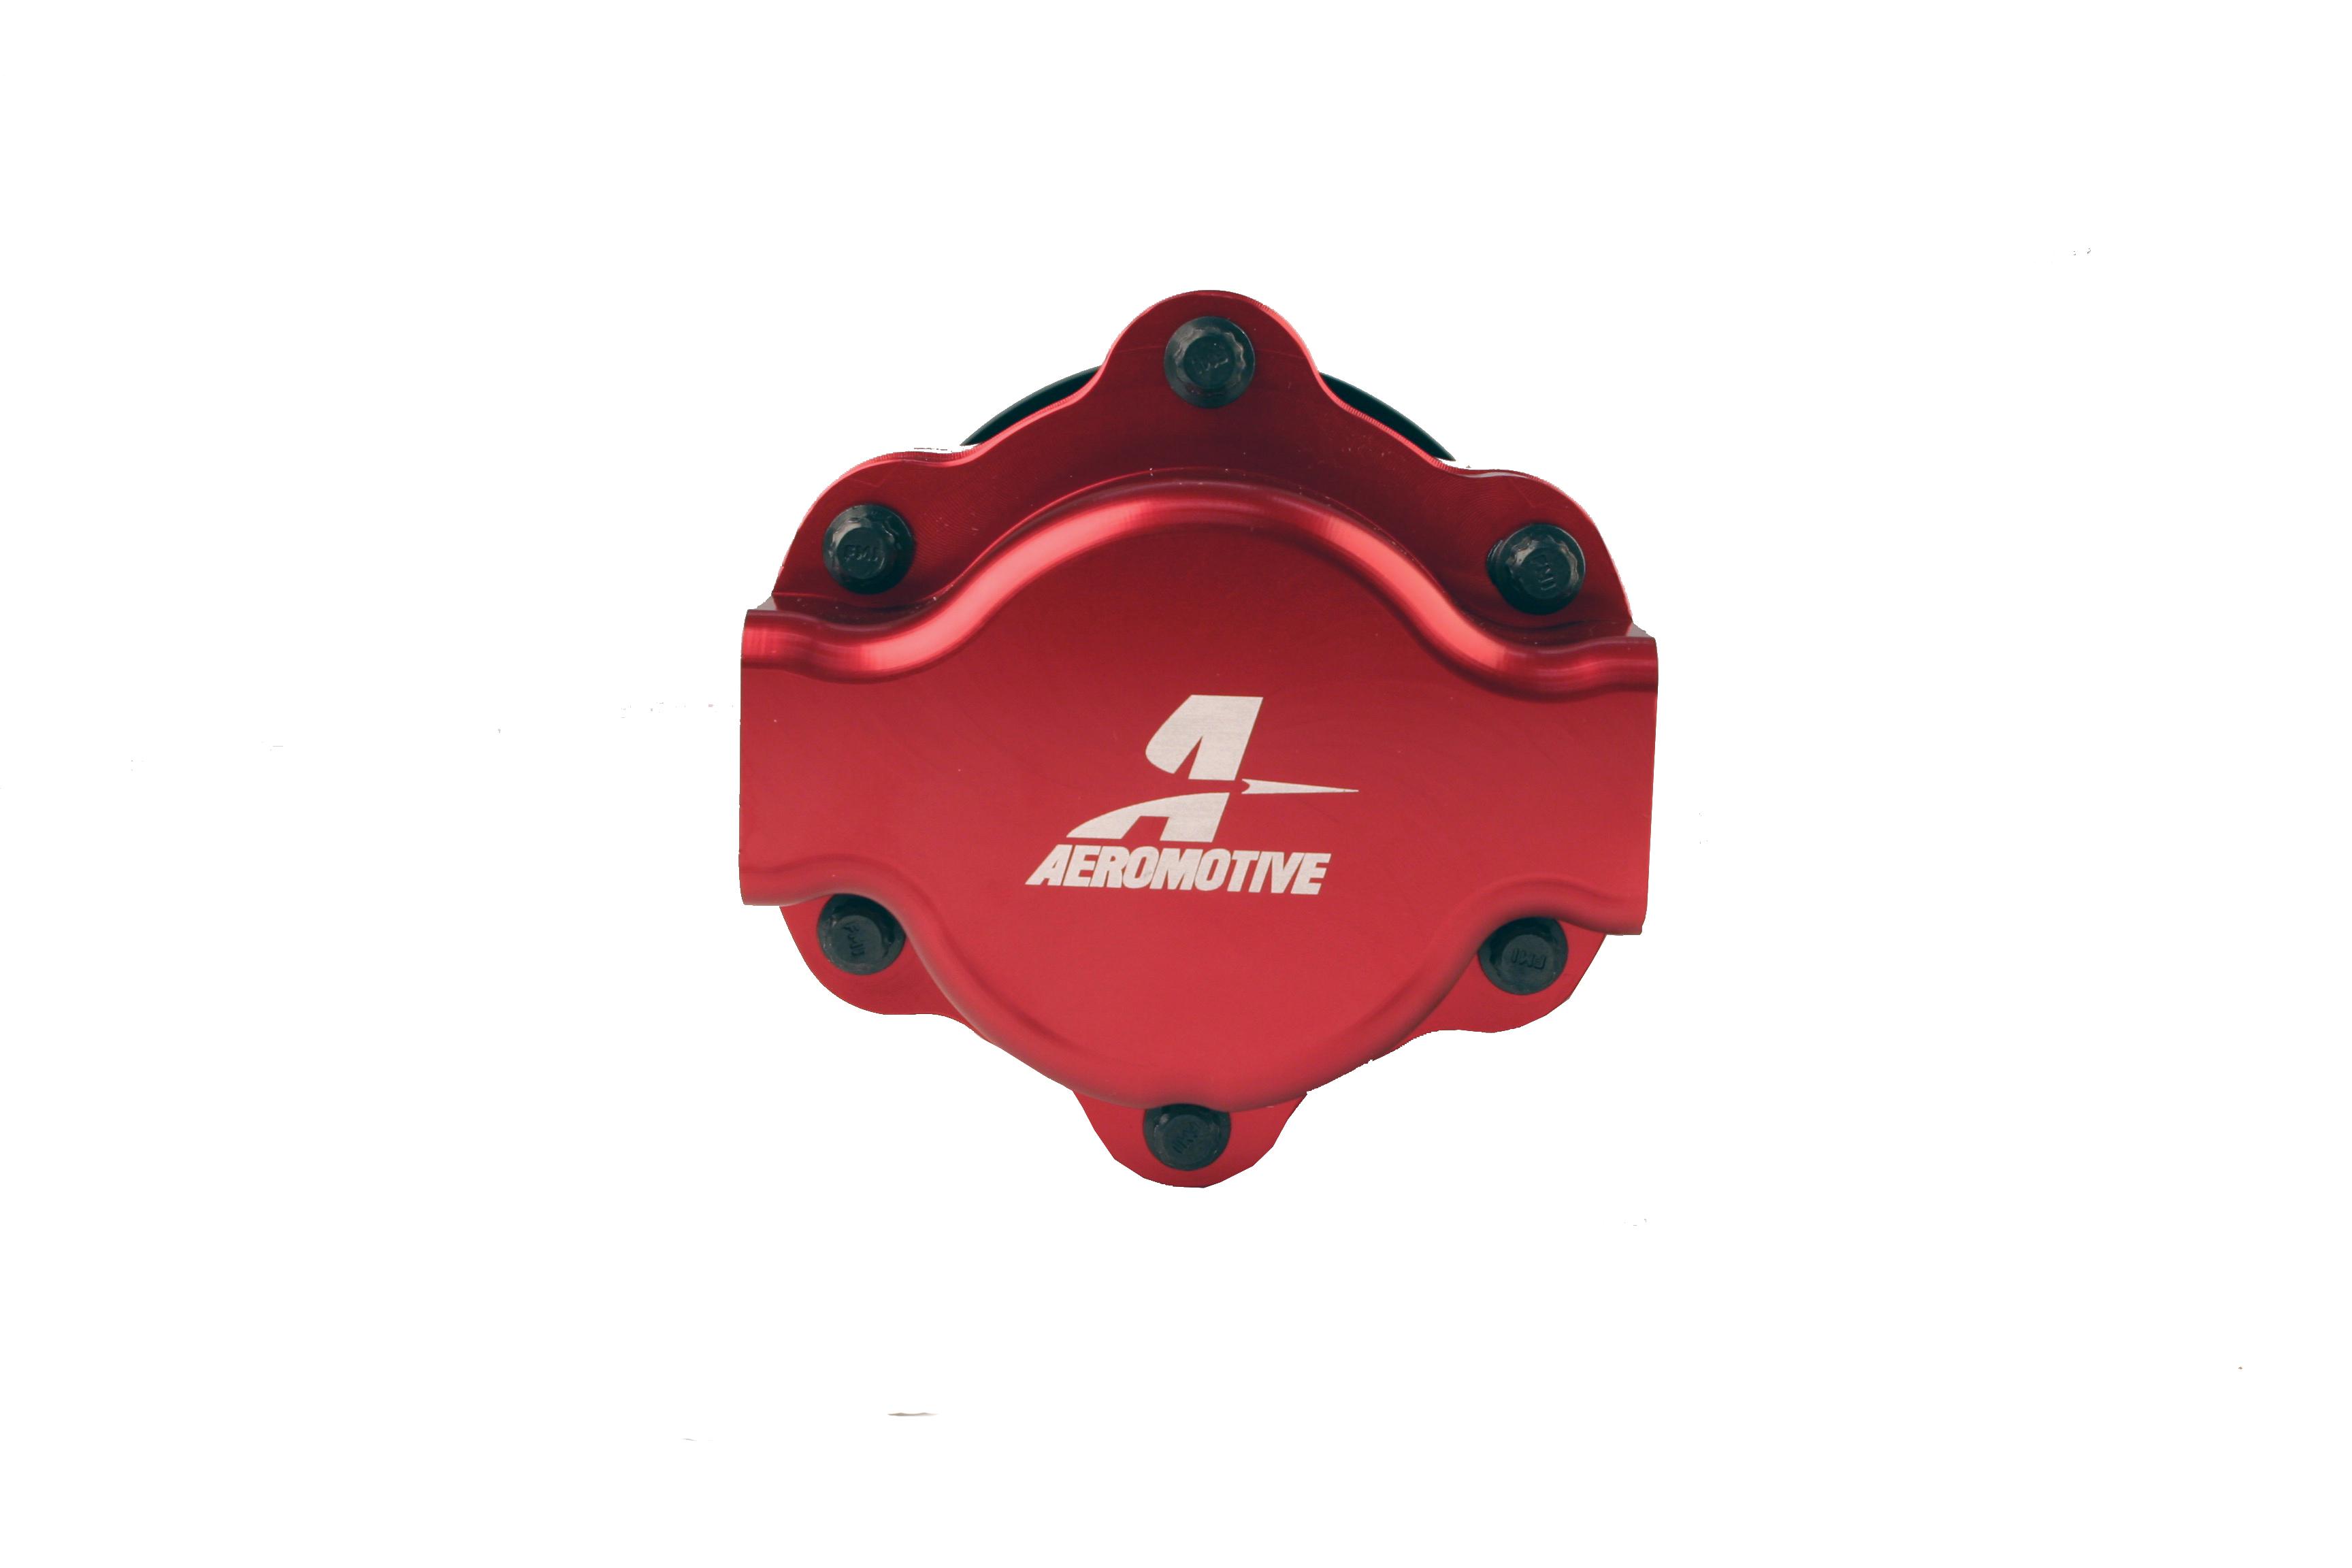 Billet Hex Drive Fuel Pump Aeromotive Inc Peterson Filters